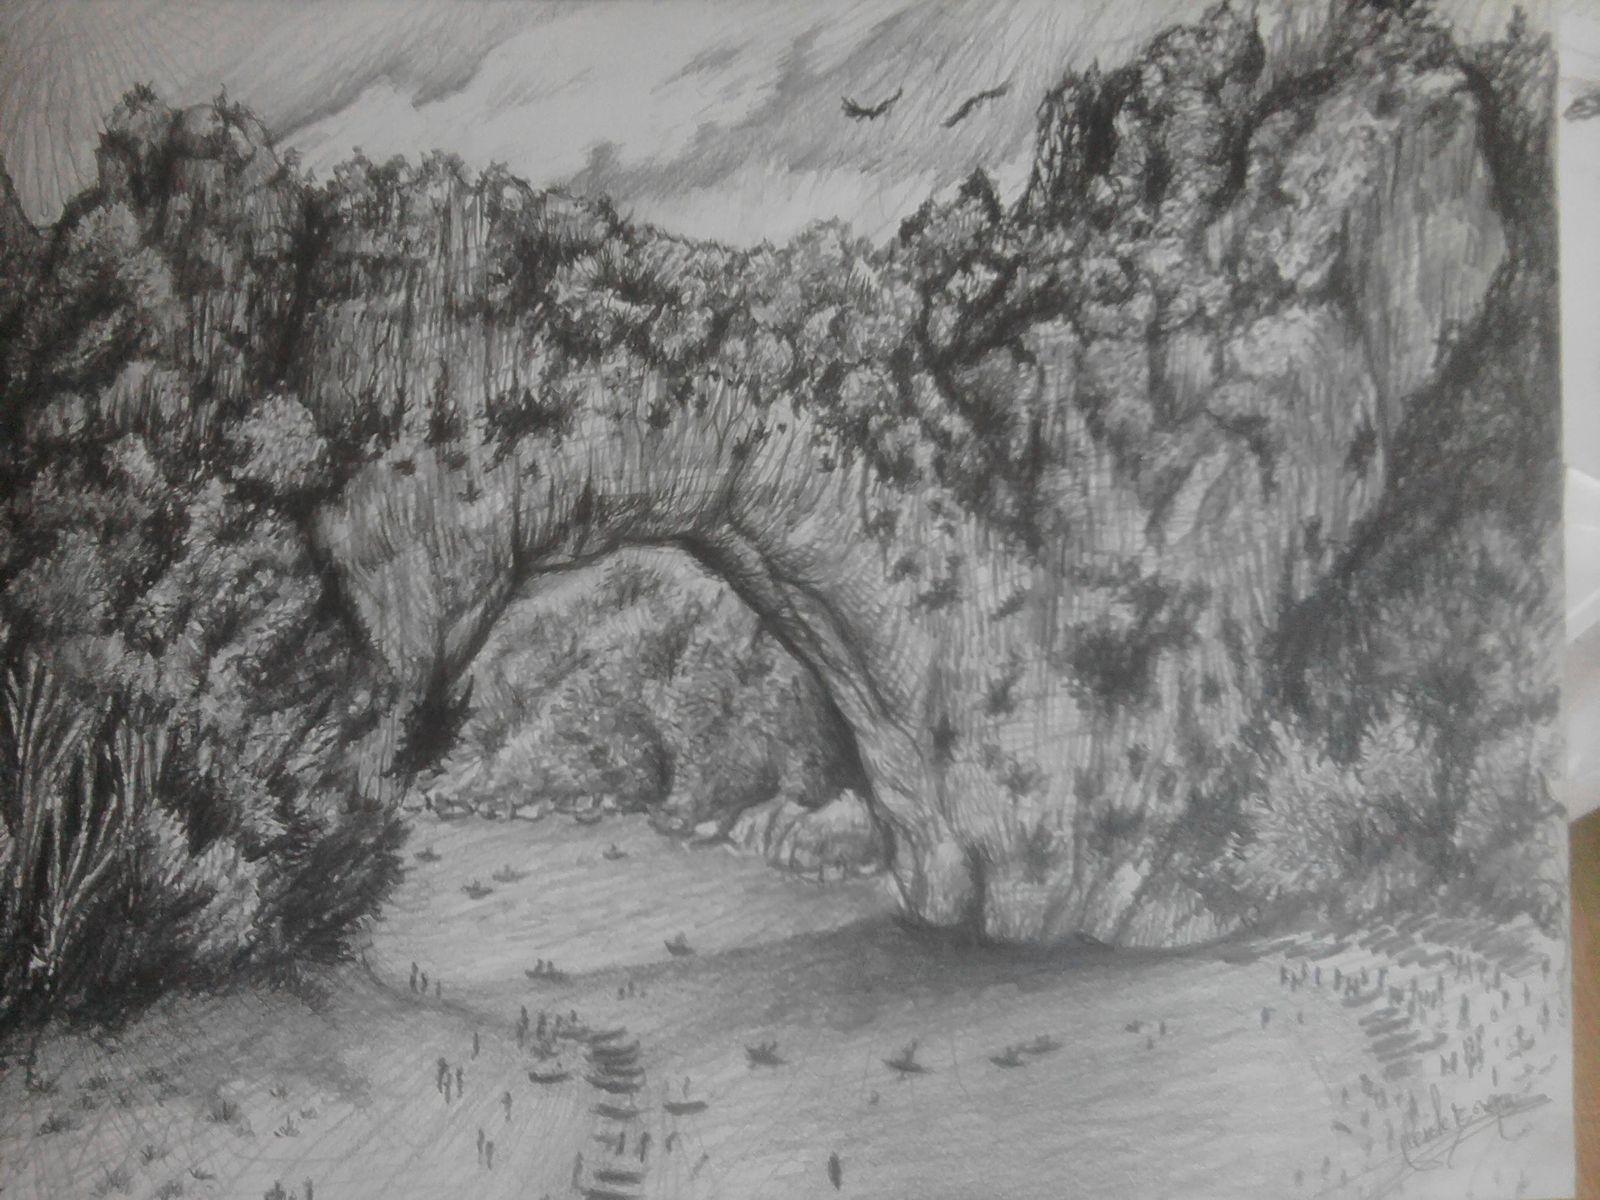 dessin dessin paysage tableau crayon paysages crayon palmiers